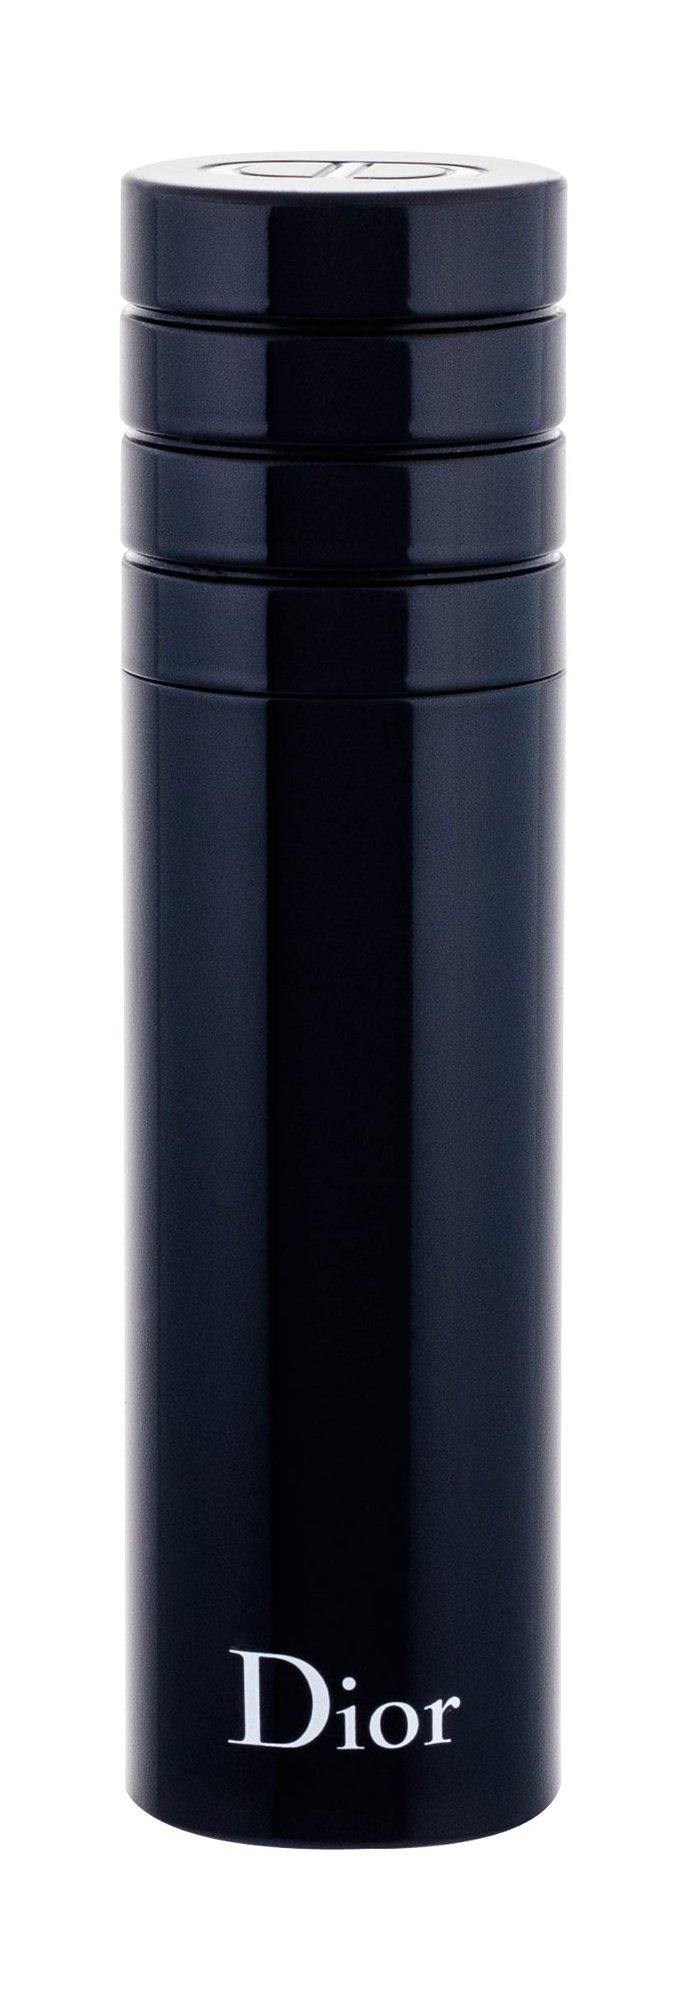 Christian Dior Sauvage, edt 10ml, Újratölthető